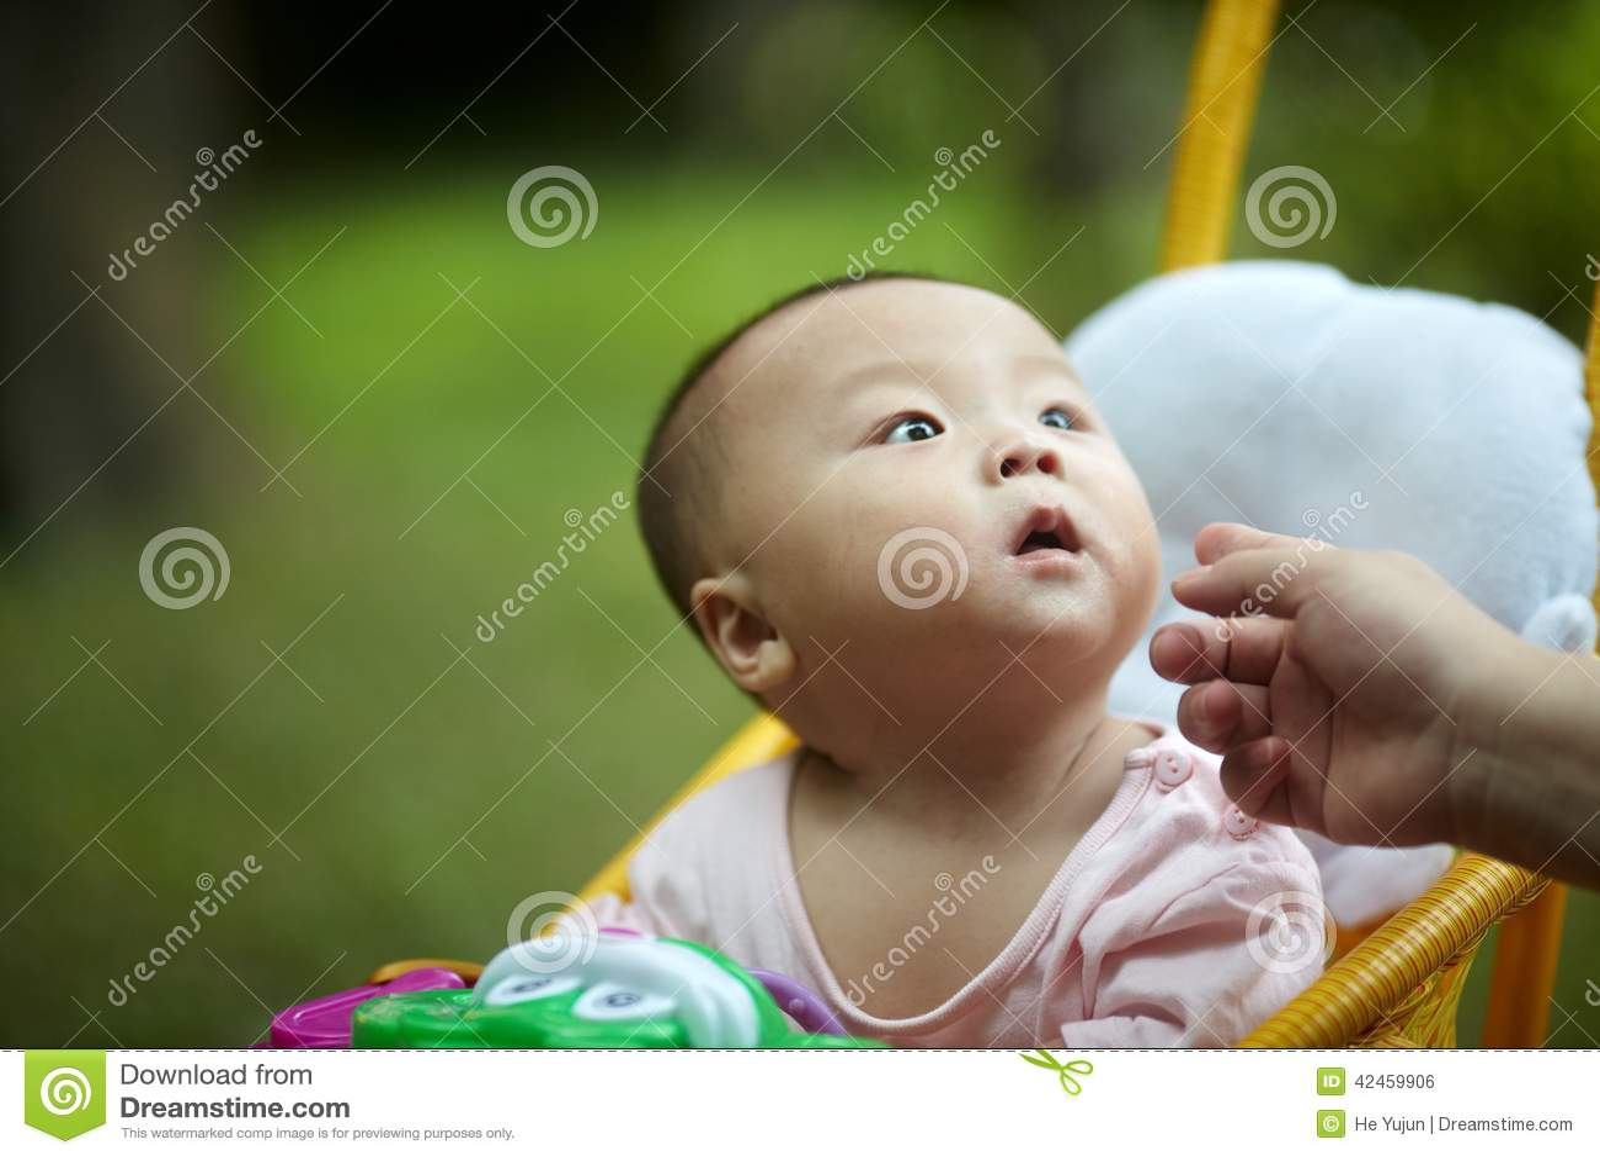 Babyblick weg